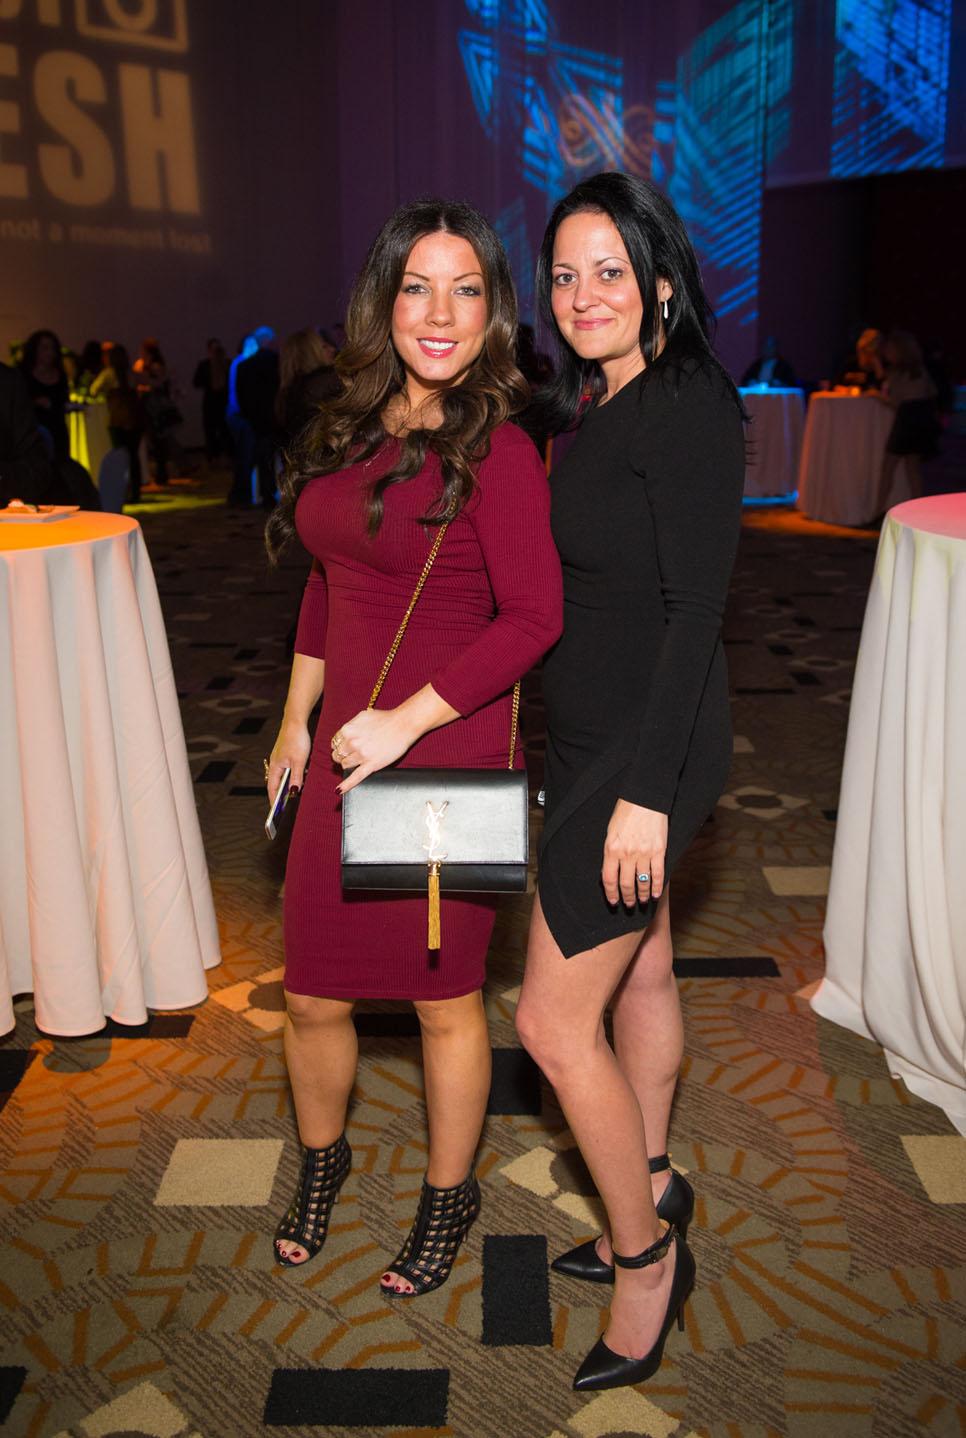 2015-12-09 ReMax Corpoarte Event - The Borgata - Atlantic City NJ - Photo Sesh - 2015-5047.jpg